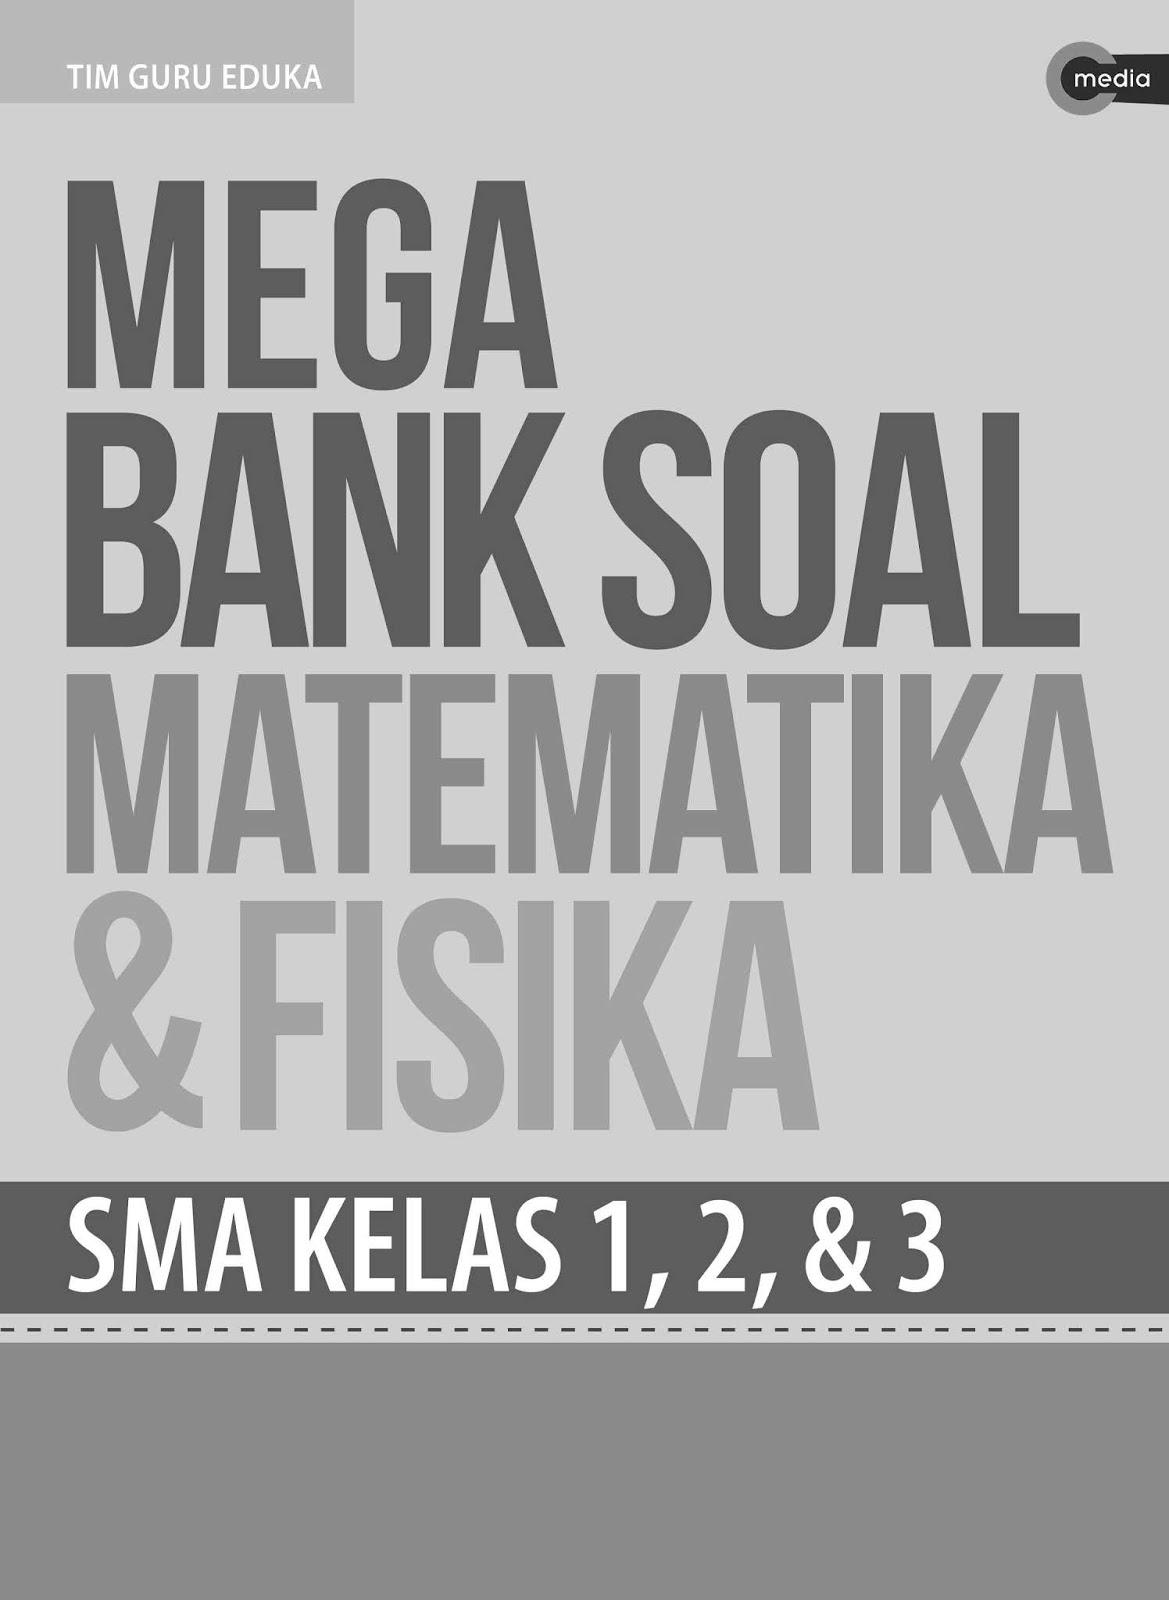 Mega Bank Soal Matematika dan Fisika Untuk Kelas 1, 2 dan 3 SMA